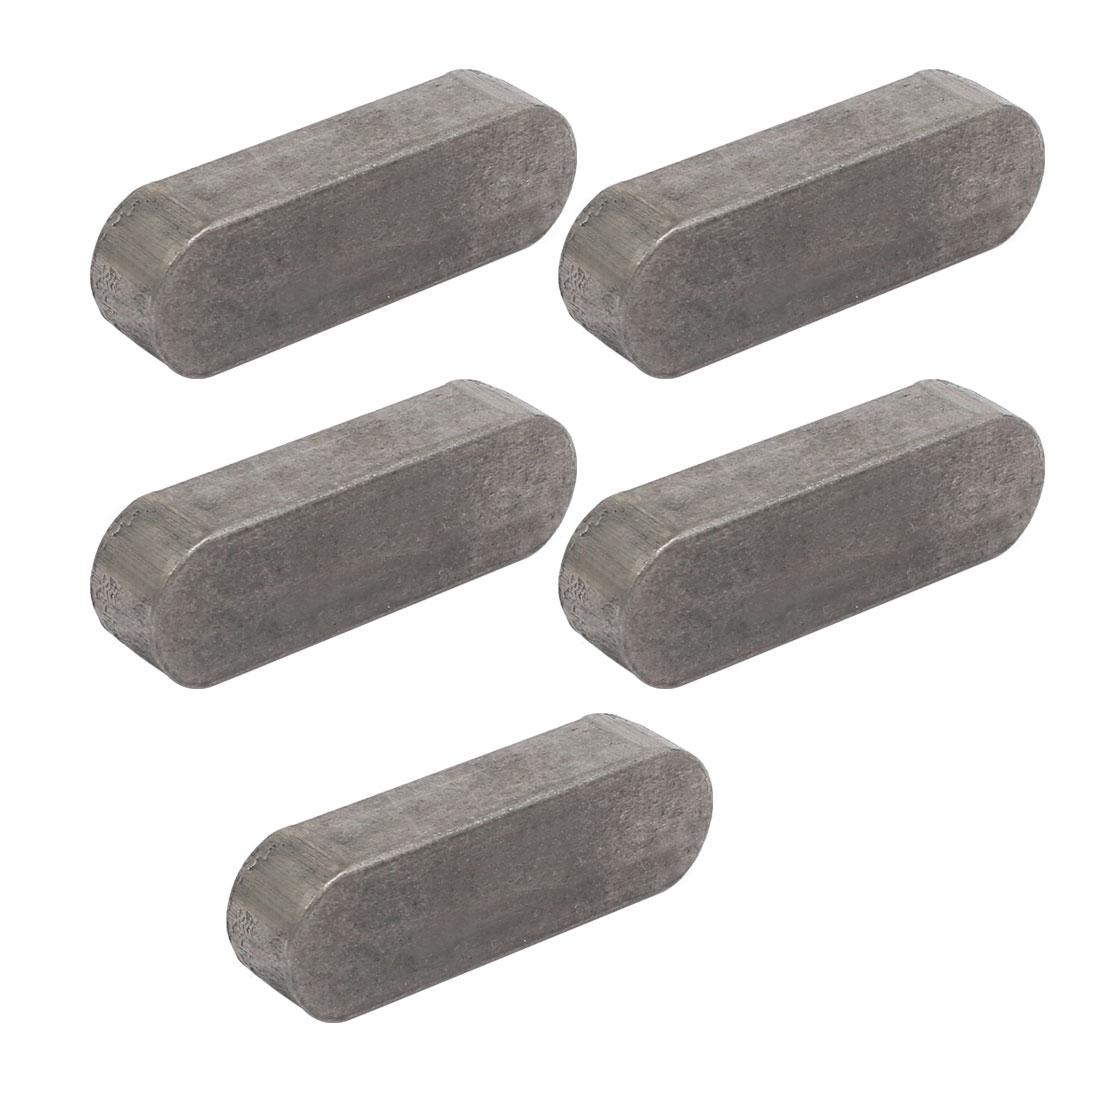 50mmx16mmx10mm Carbon Steel Key Stock To Lock Pulleys 5pcs